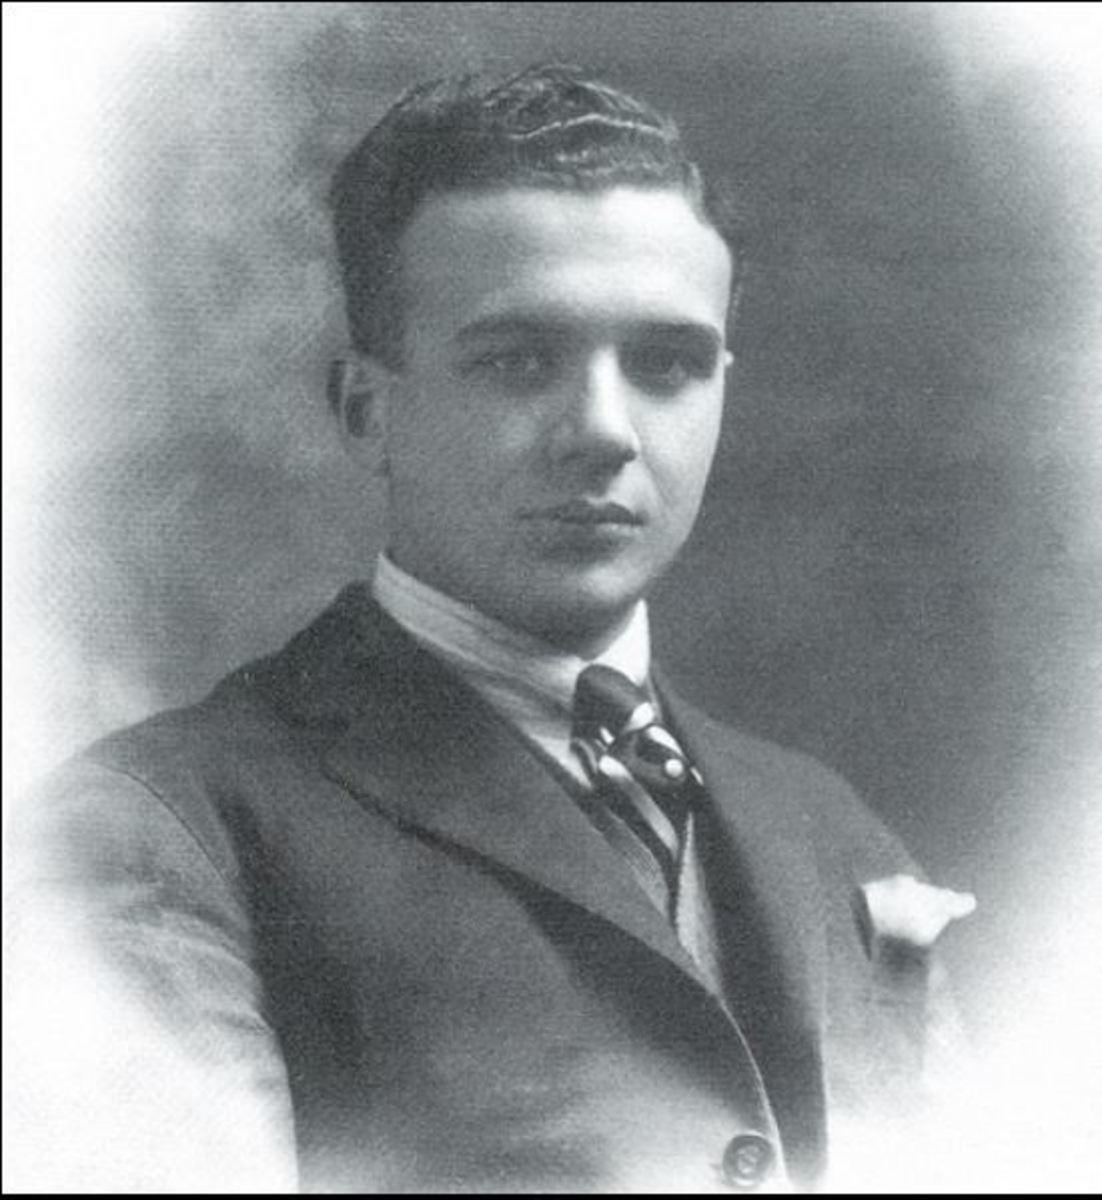 Gustavo Adolfo Rol ca. 1923